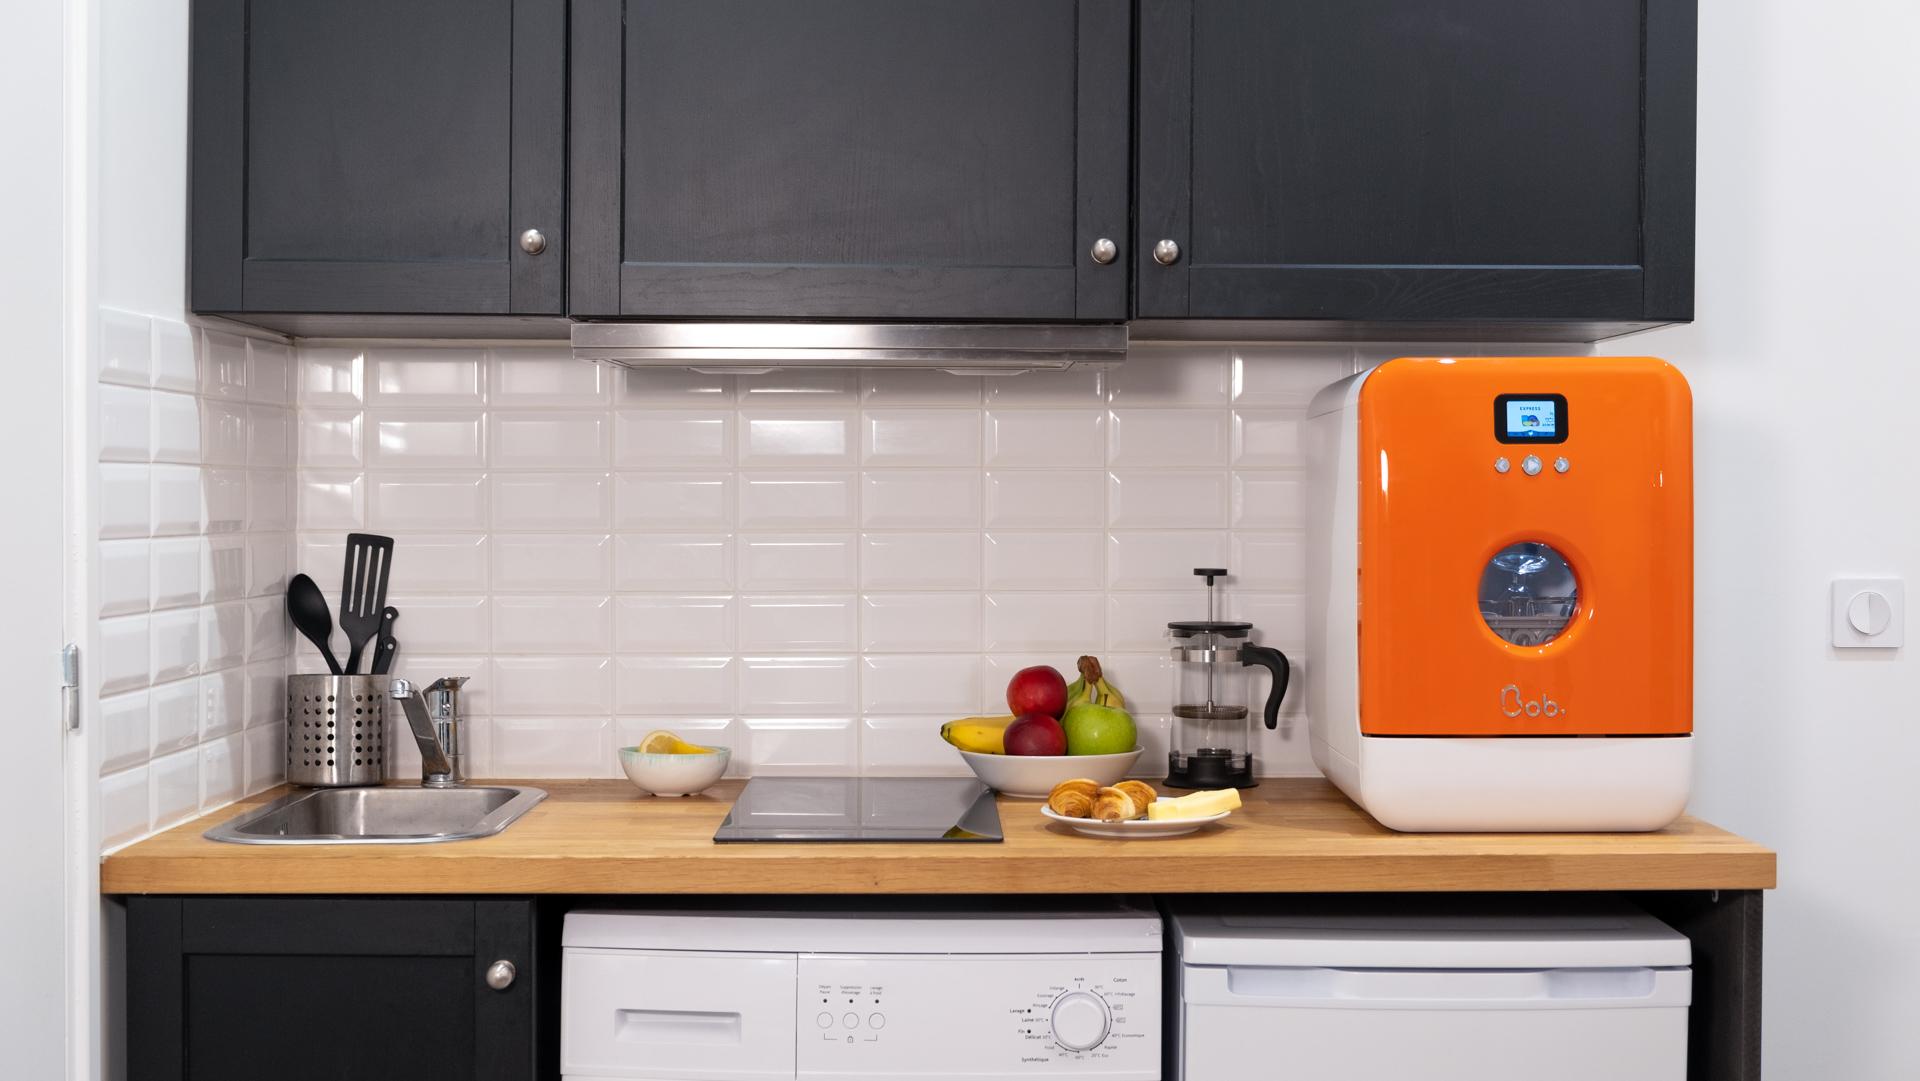 Bob small mini lave vaisselle dishwasher small kitchen student orange